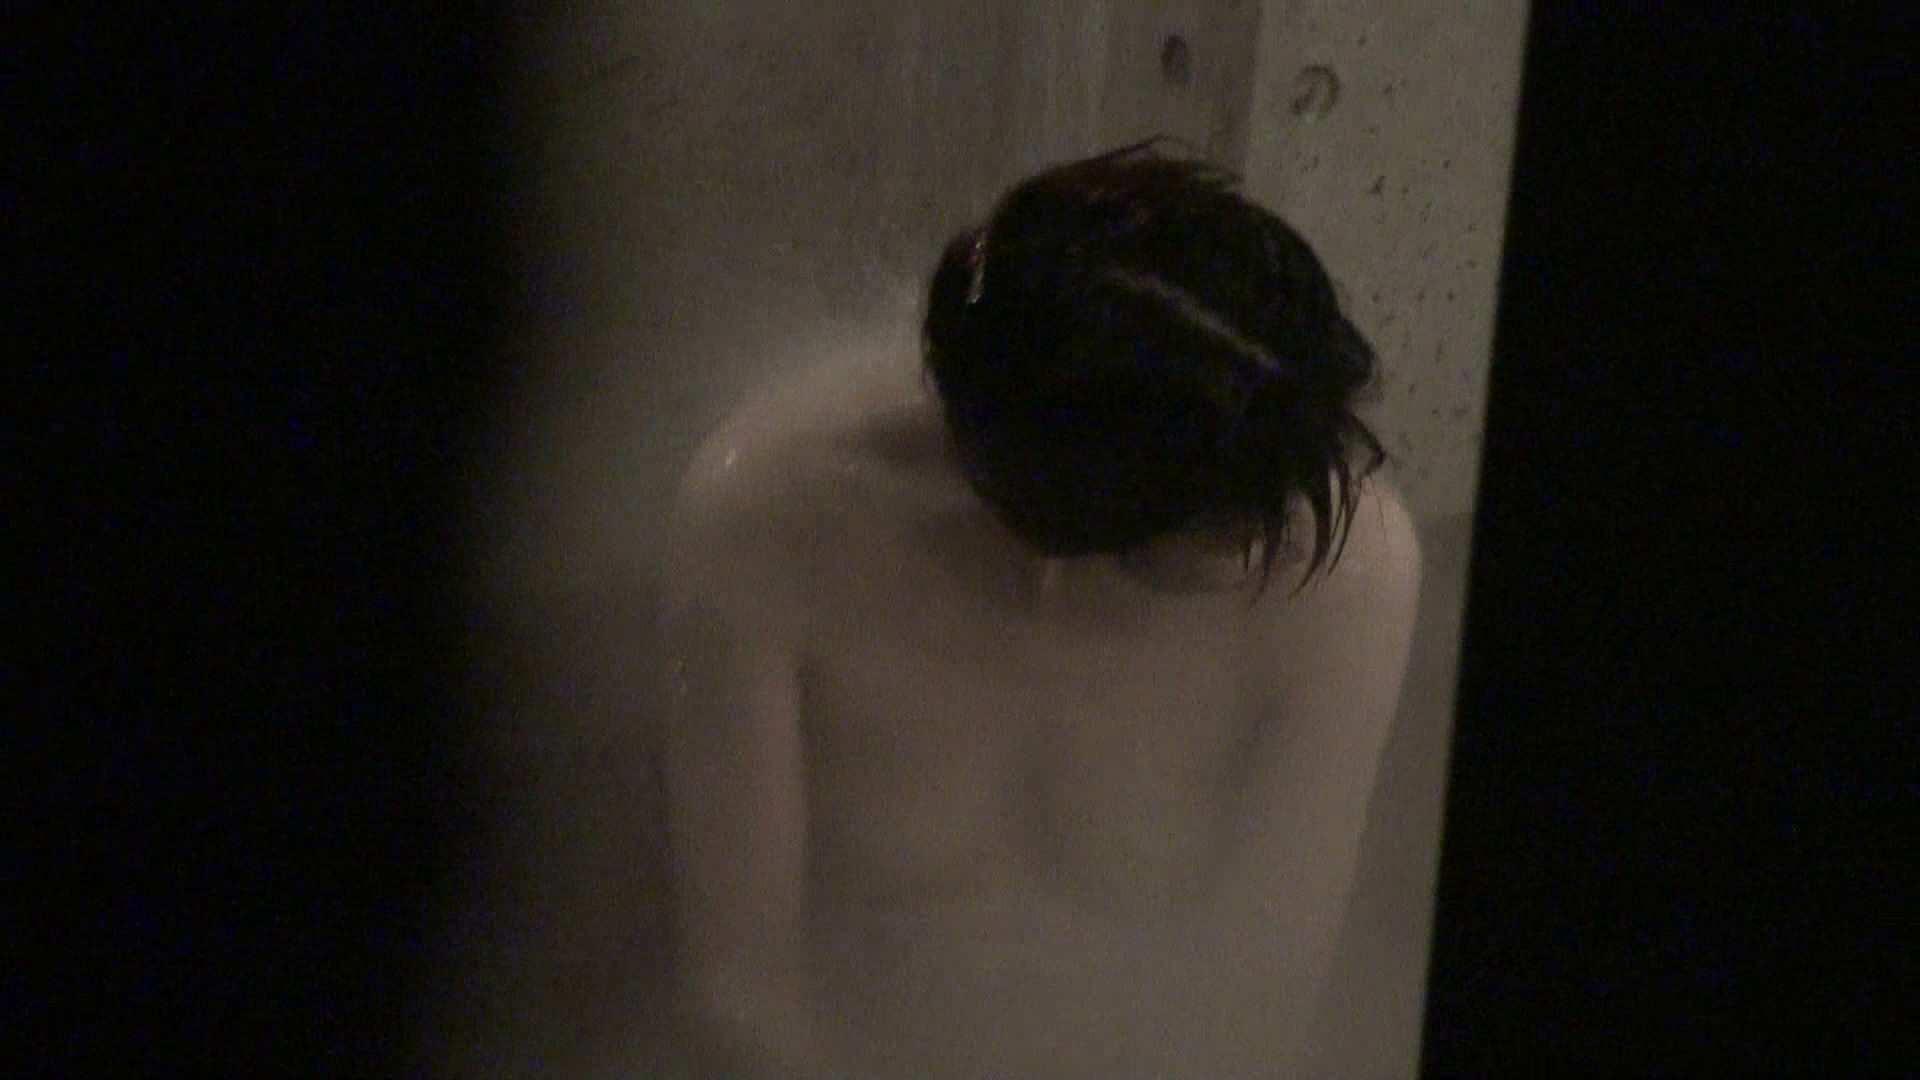 Aquaな露天風呂Vol.438 0 | 0  65連発 25